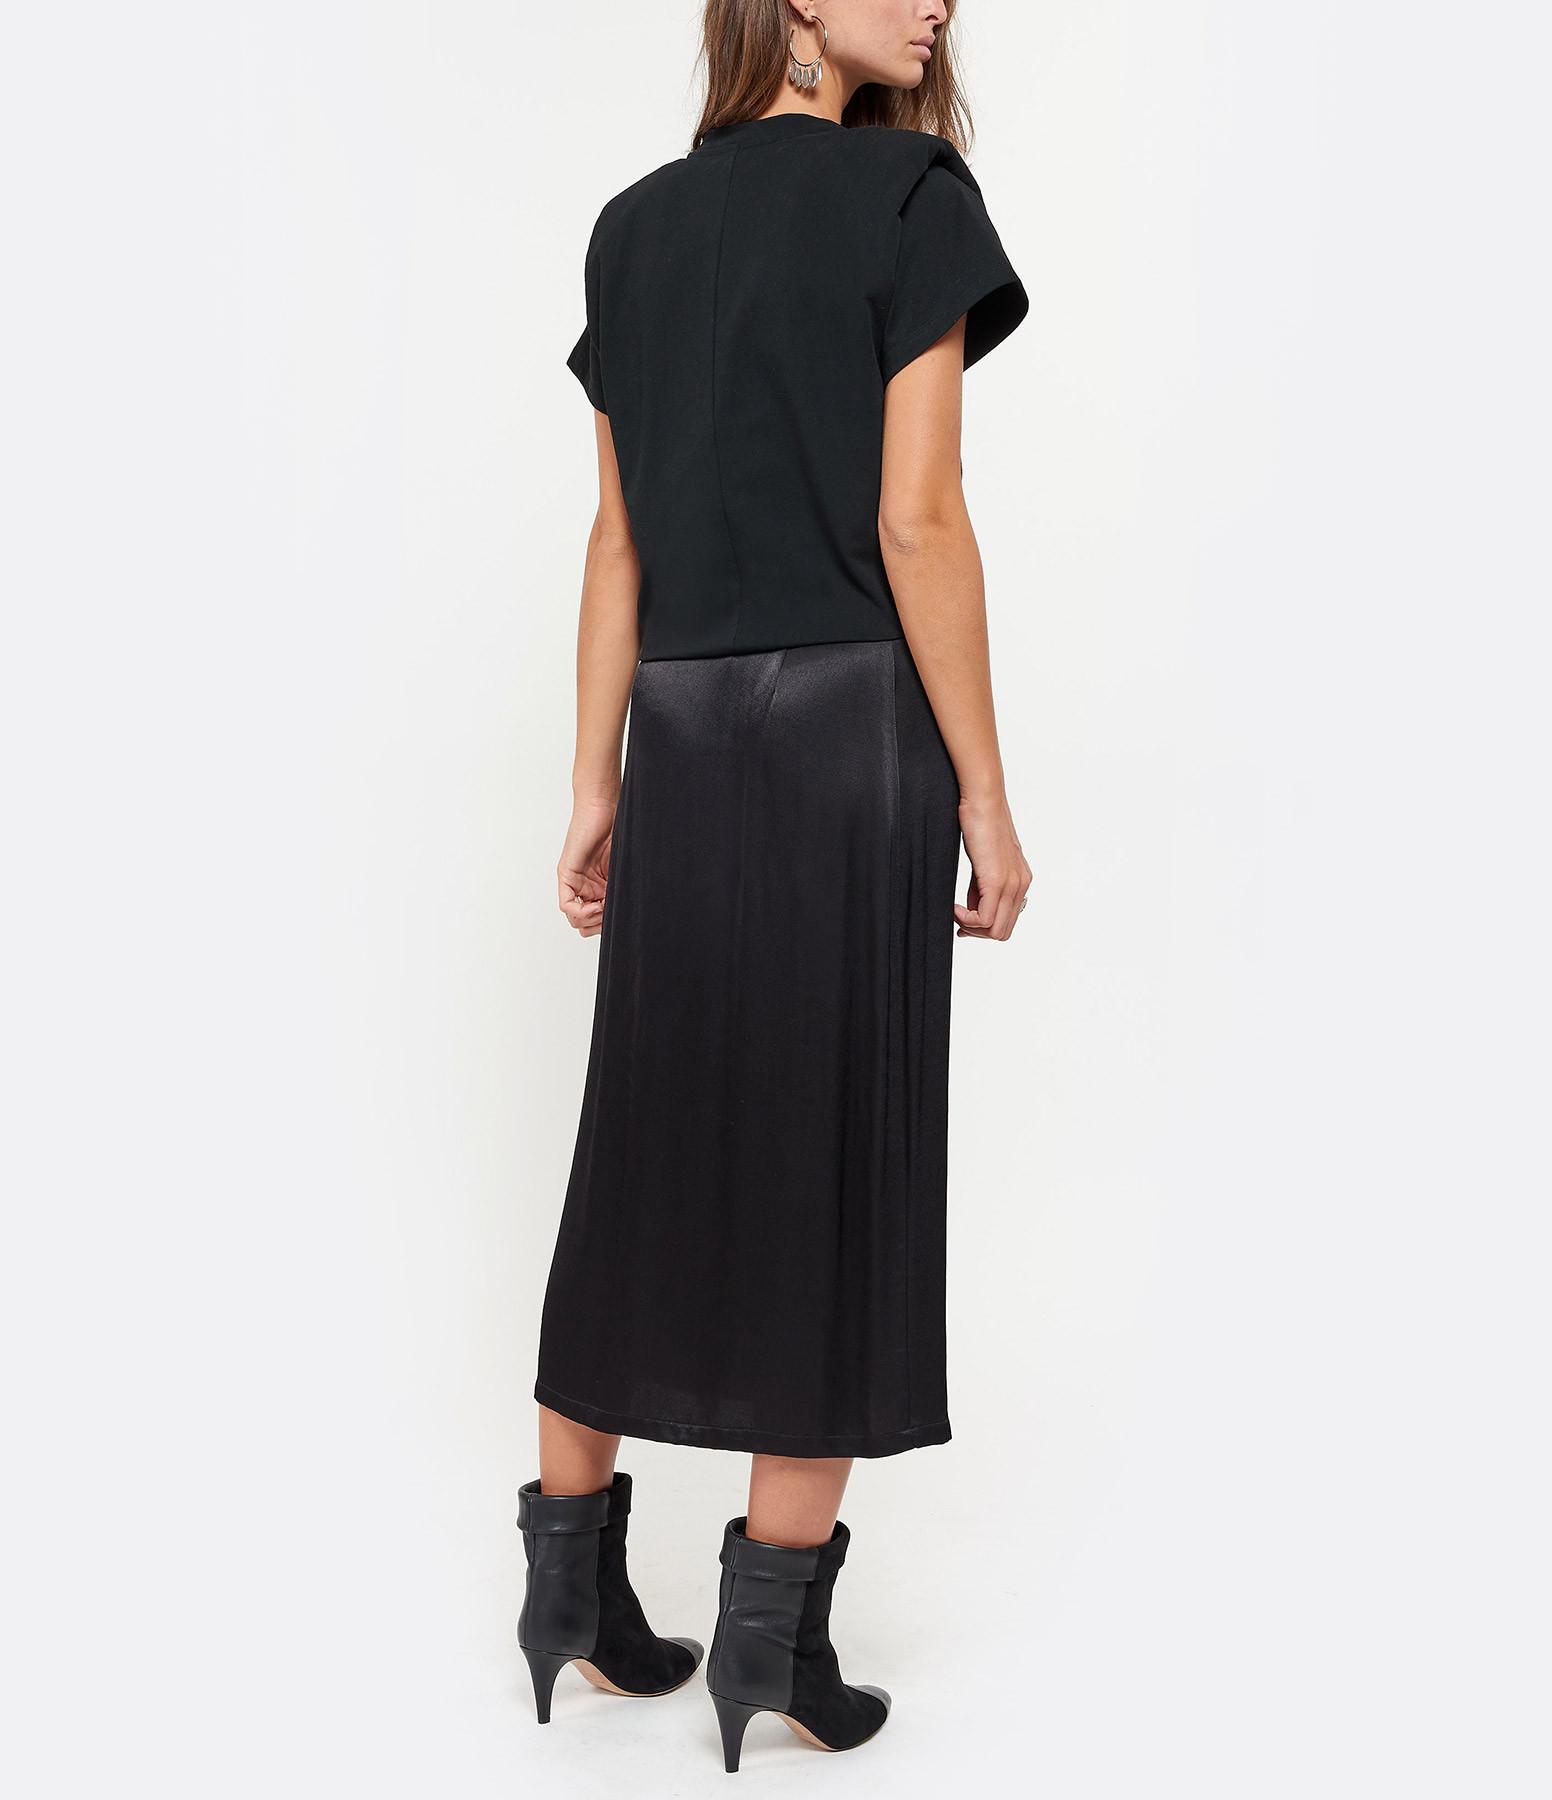 ISABEL MARANT - Tee-shirt Belita Noir